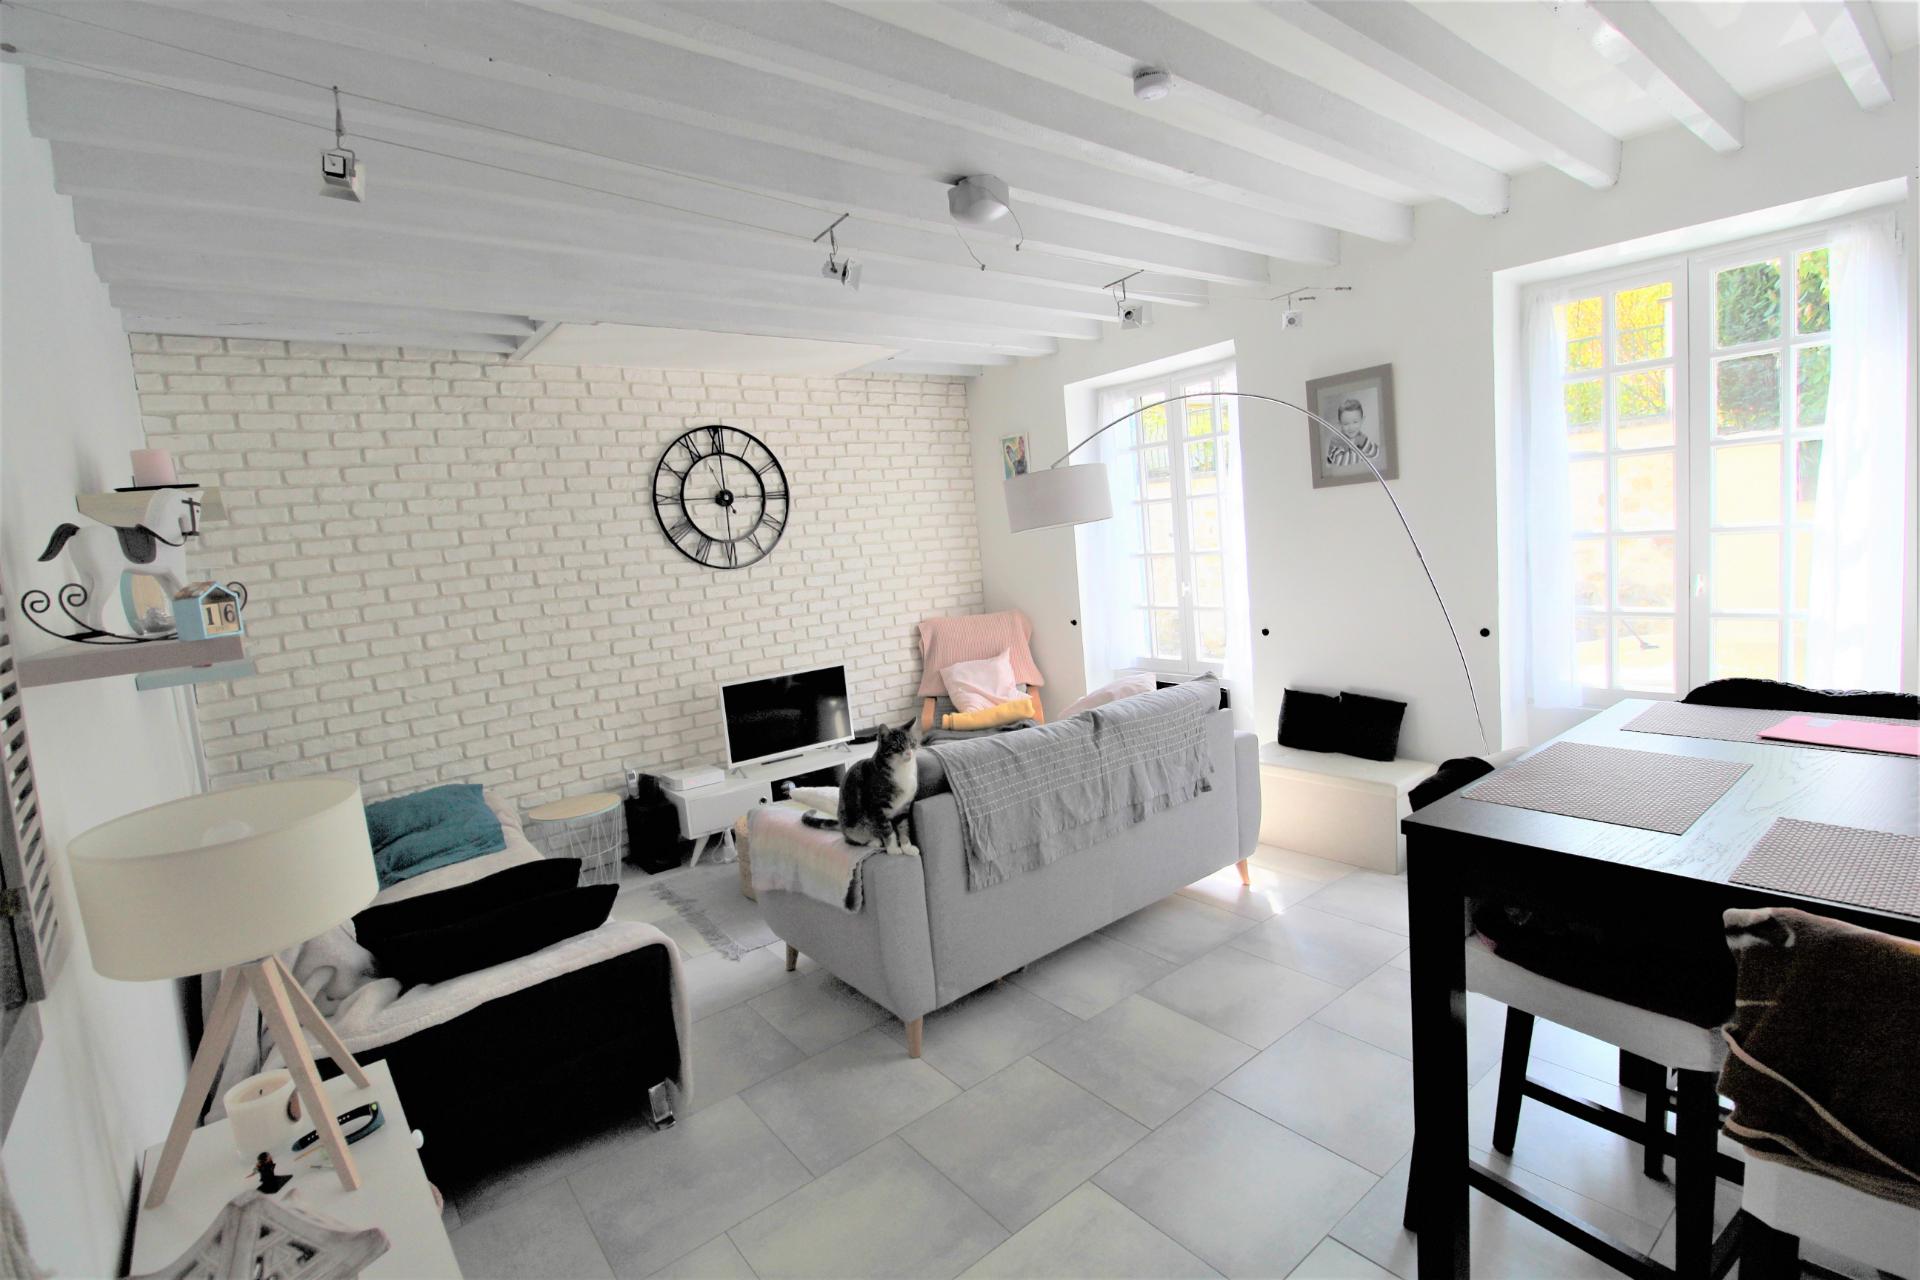 Maison ancienne rénovée avec goût - Stéphane Plaza Immobilier